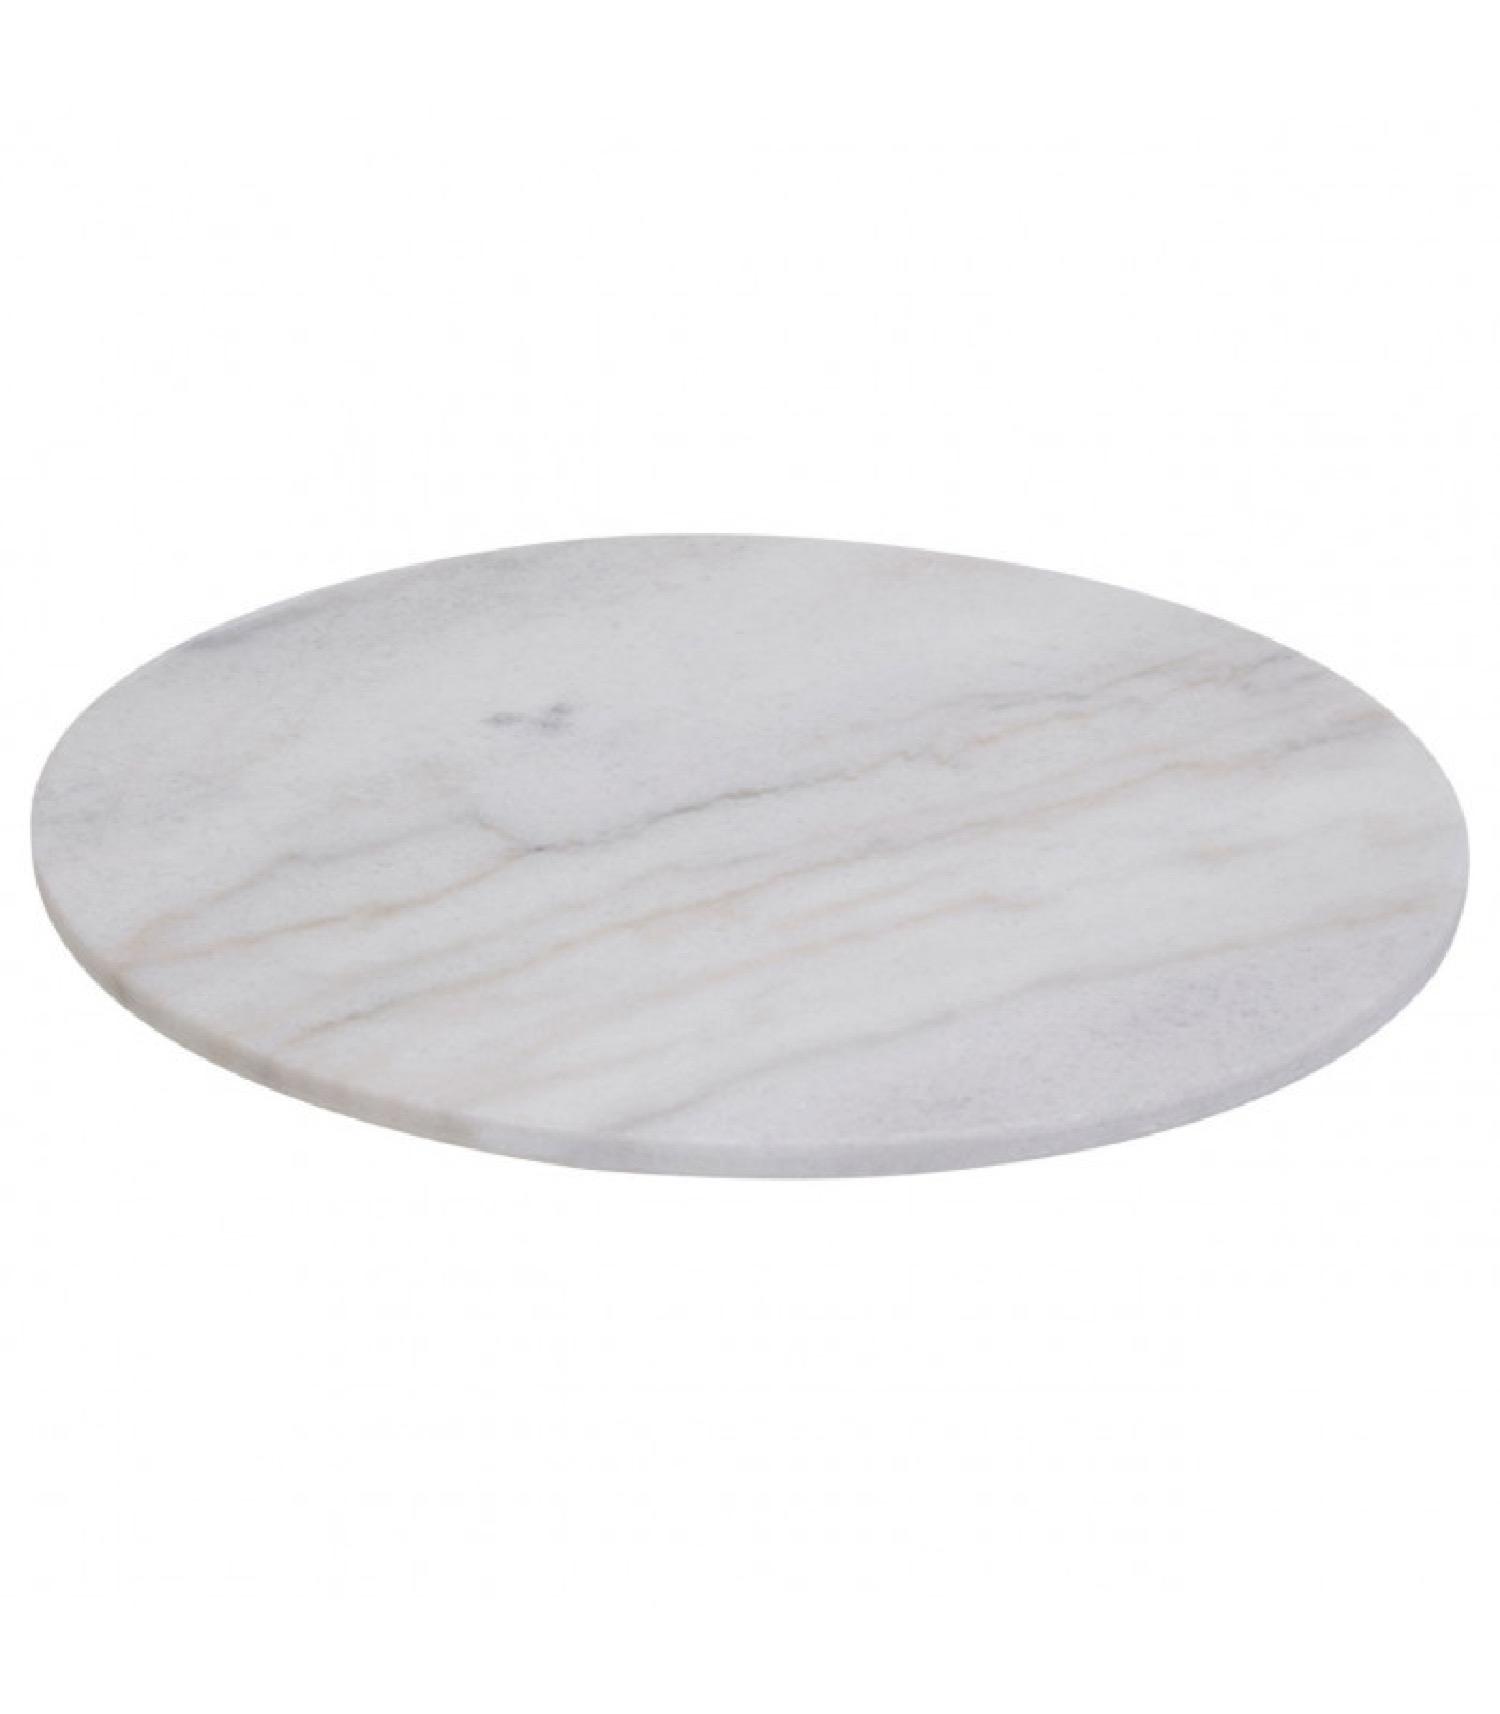 Plat de présentation rond rotatif en marbre blanc